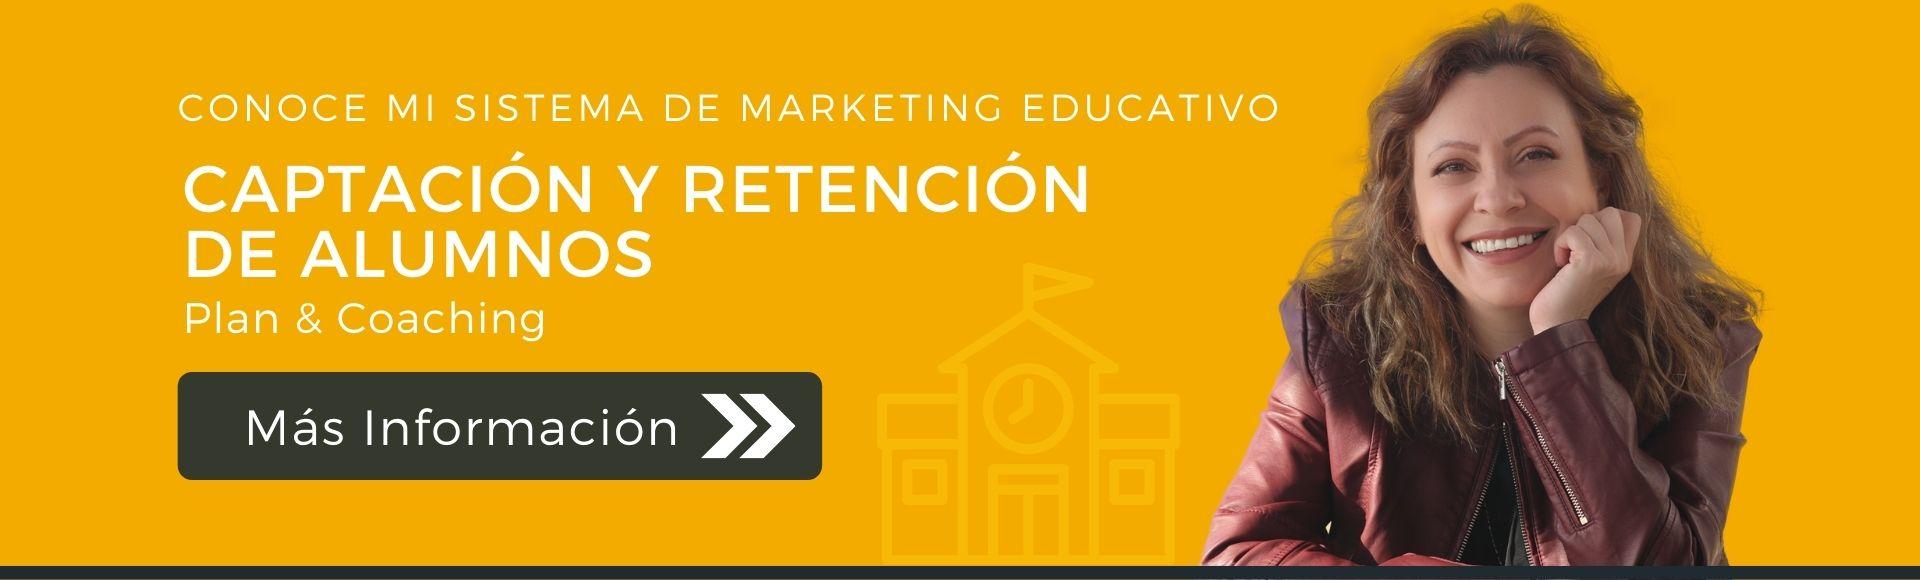 Marketing_Educativo_Sistema